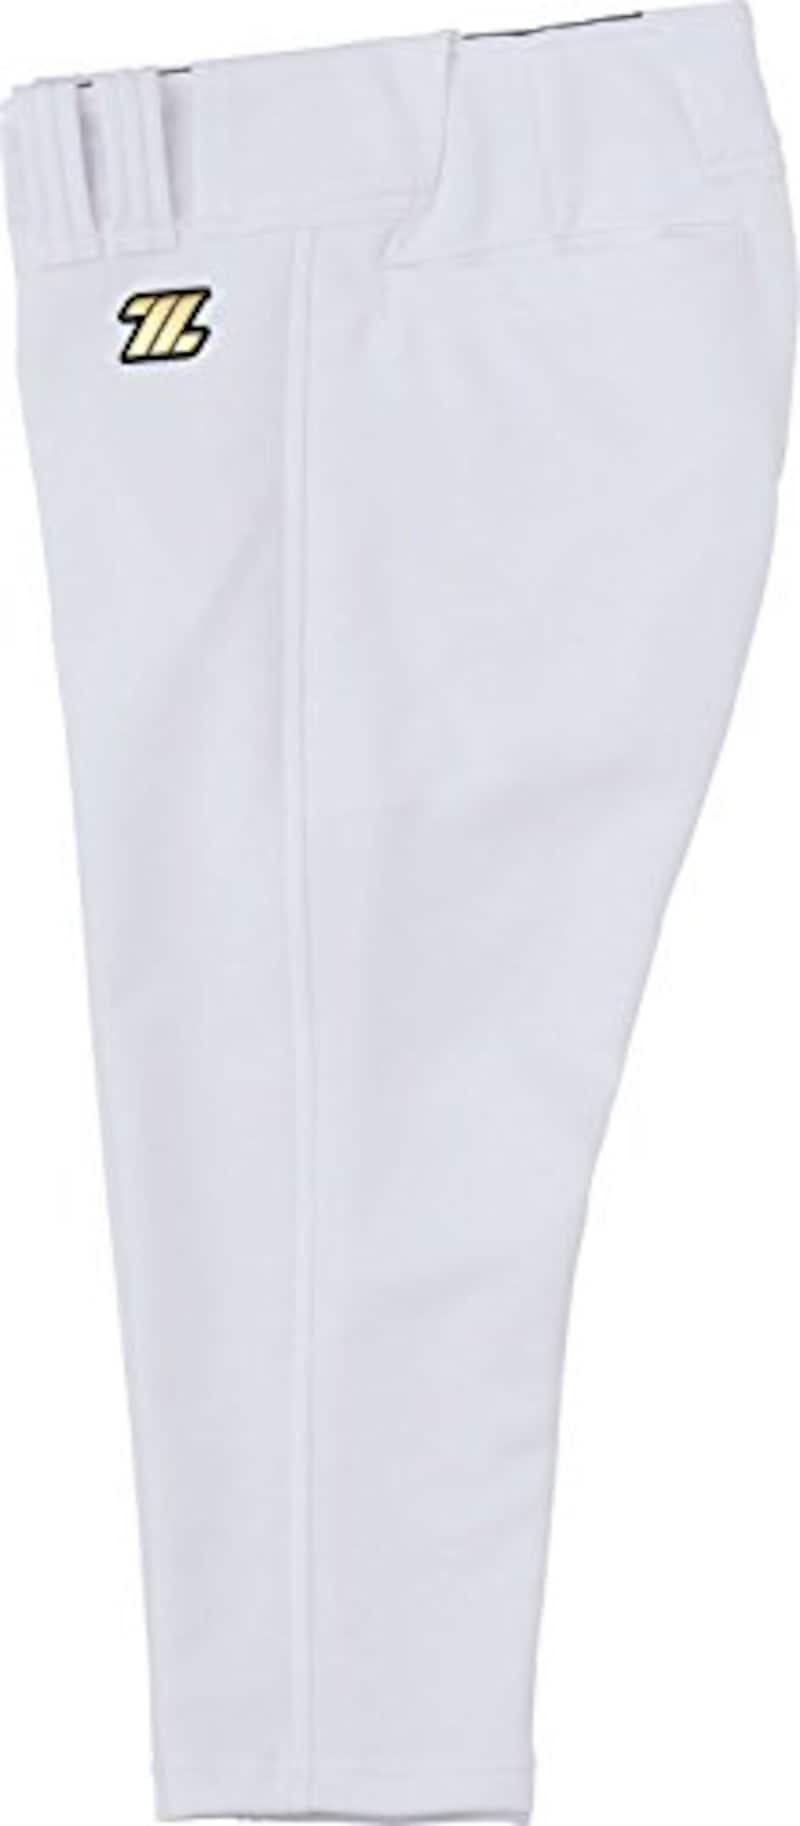 ZETT(ゼット) 野球 少年用 ユニフォーム ショート パンツ メカパン BU2182CP